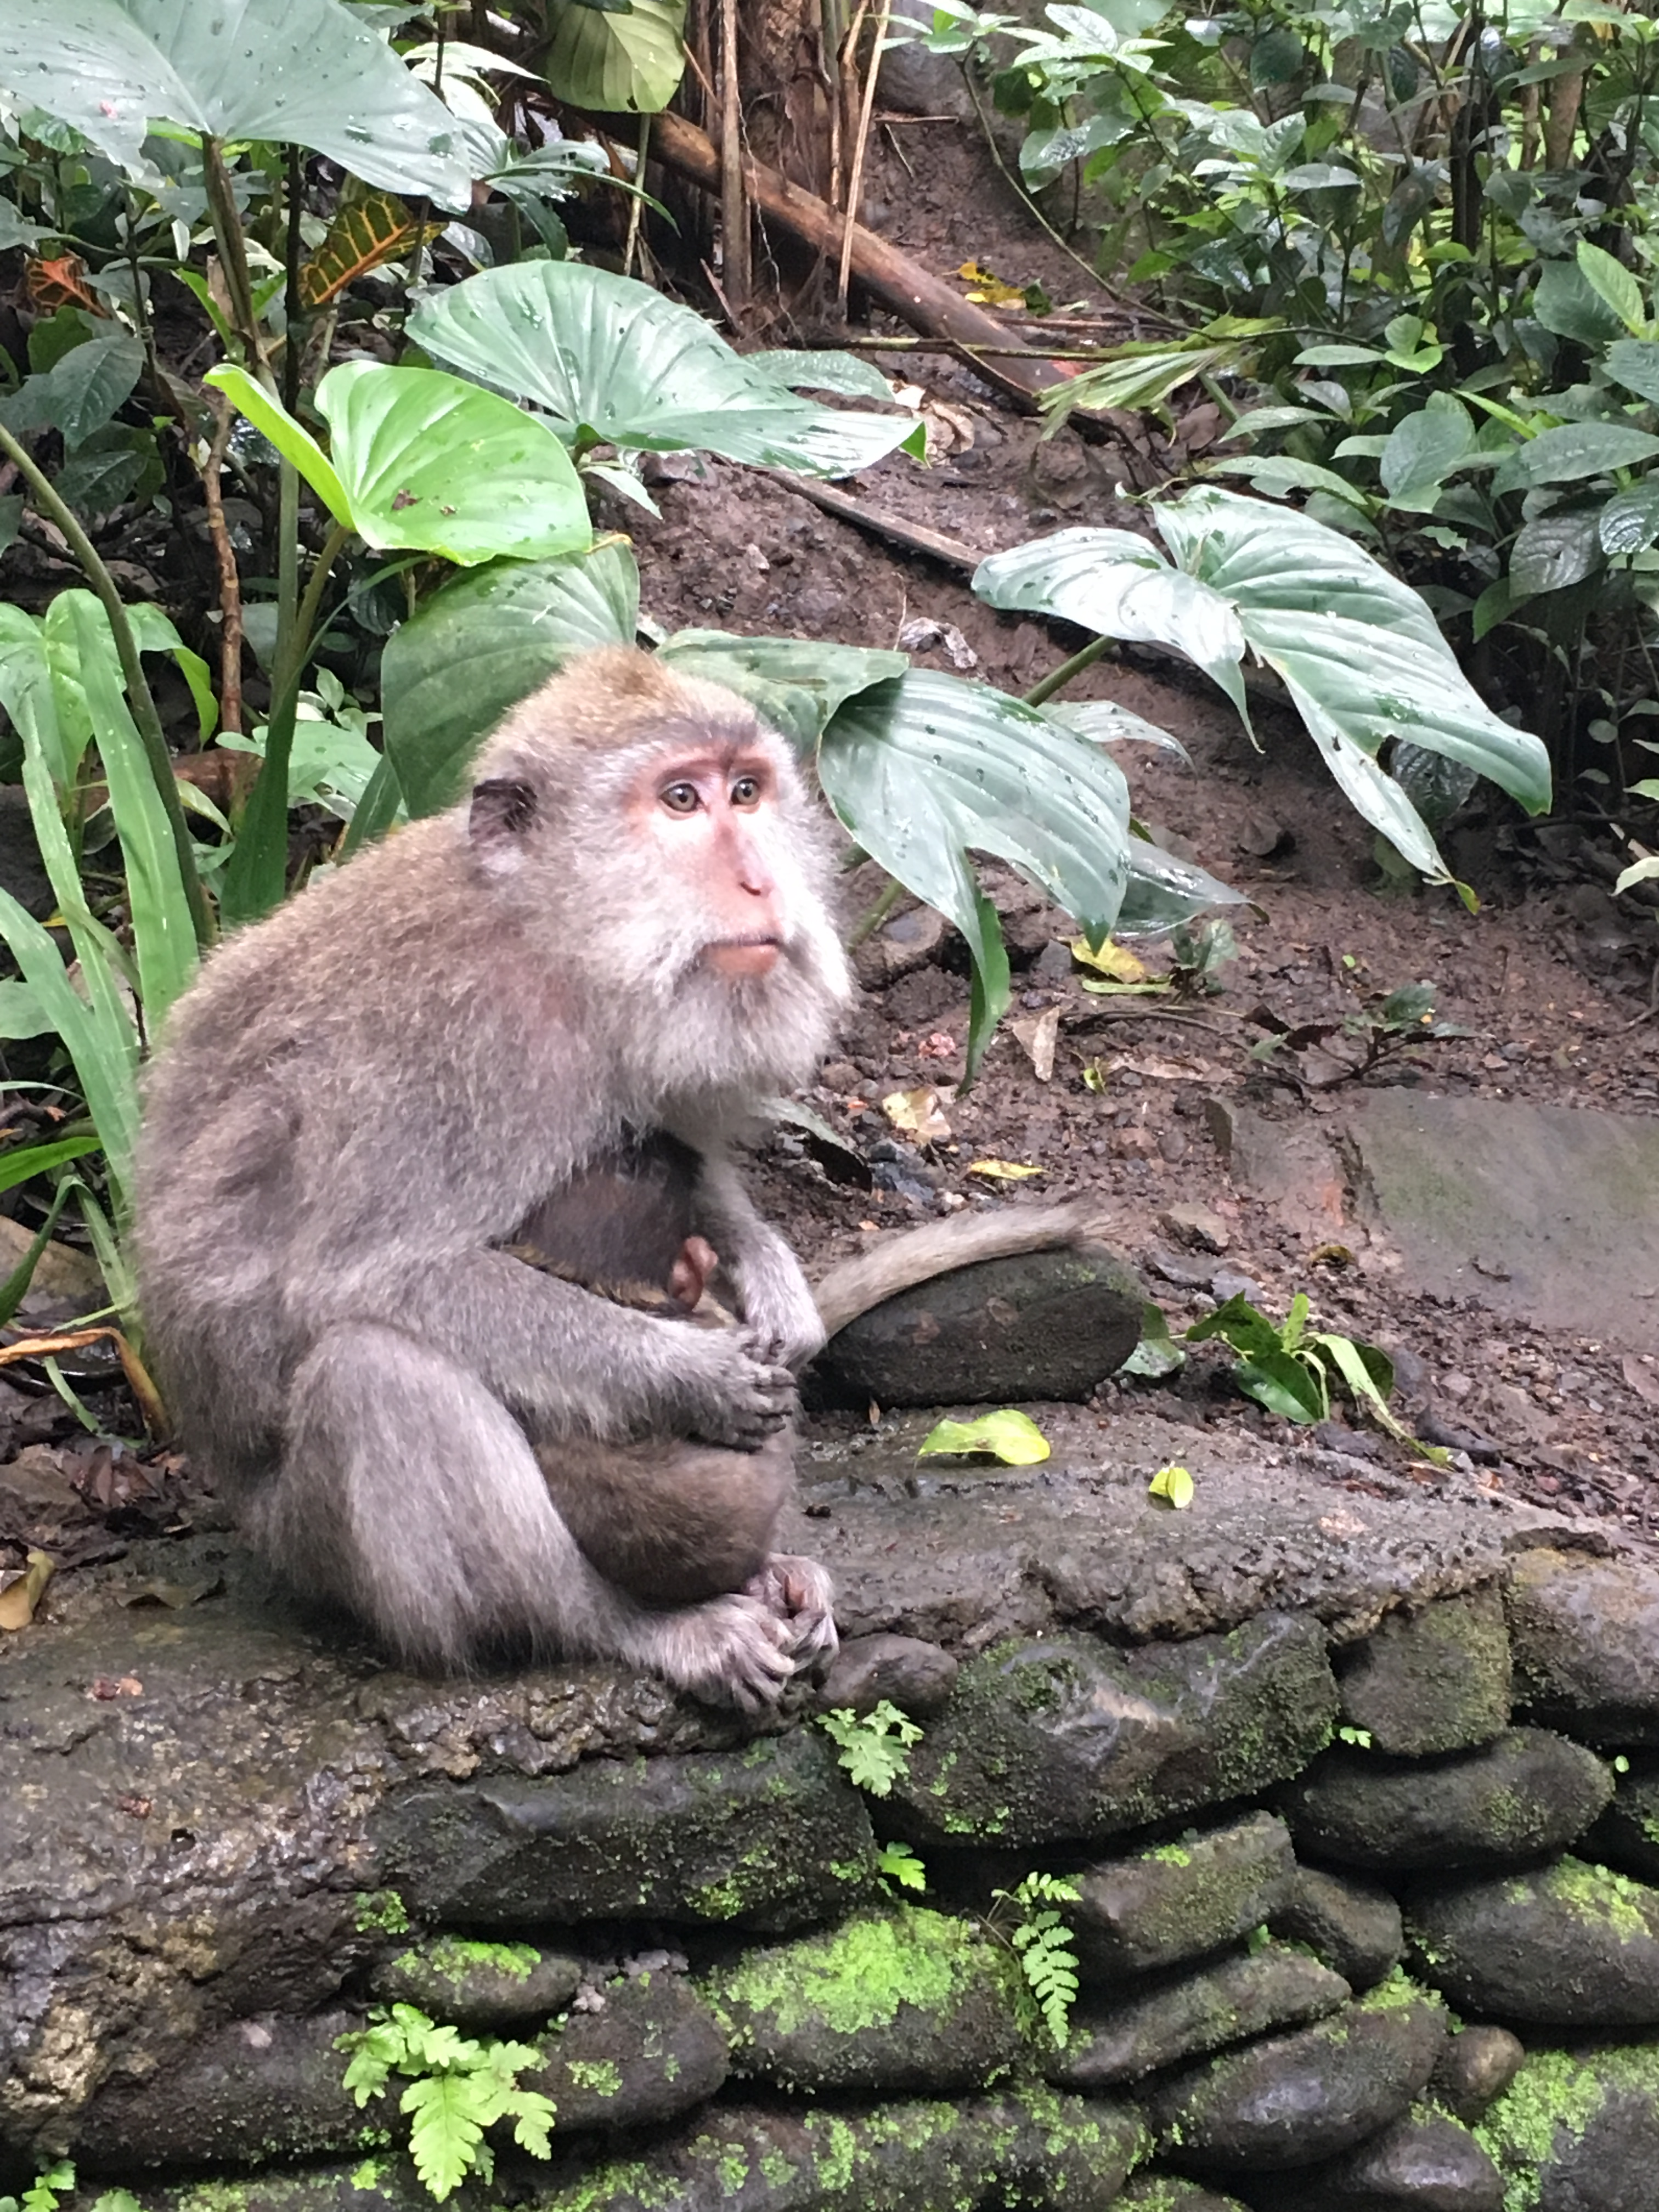 2017-03-27 Bali Ubud Monkey Forest 2.jpg